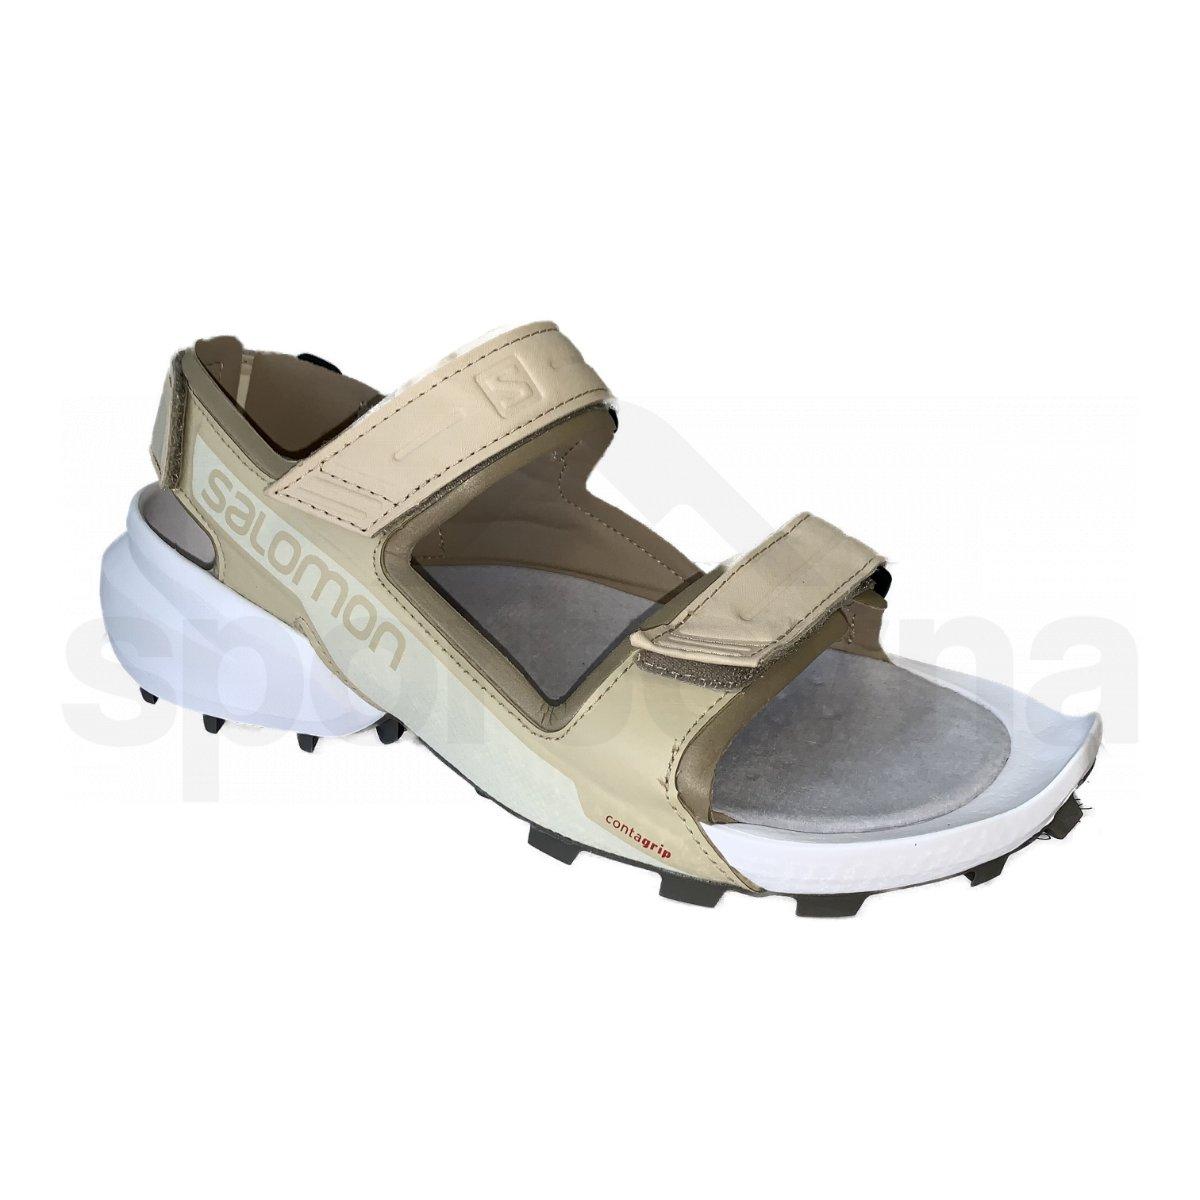 L413000 Speedcross sandal 1